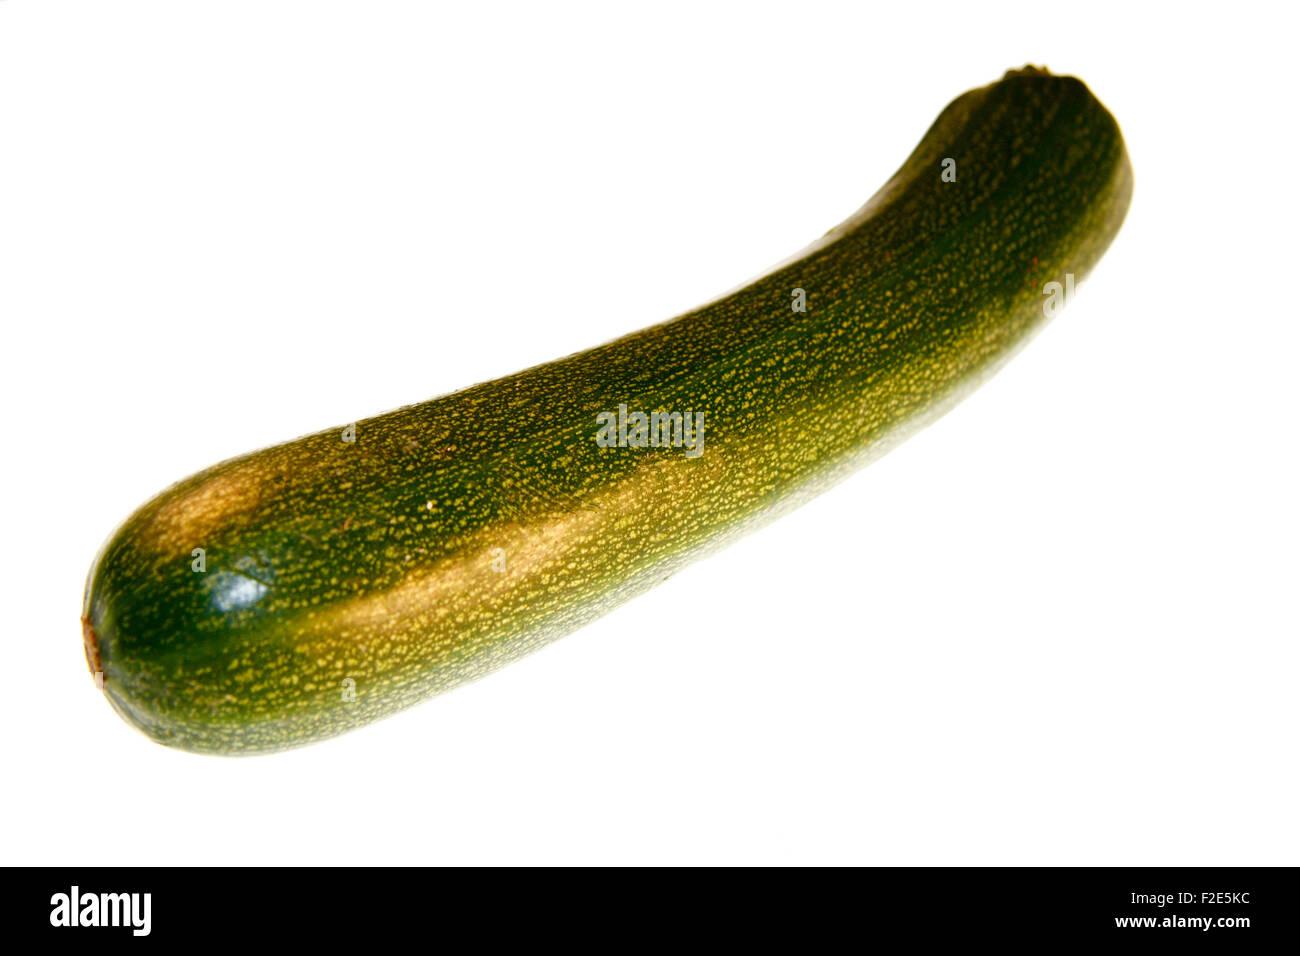 Zucchini / Zucchetti / courgette - Symbolbild Nahrungsmittel. Stock Photo